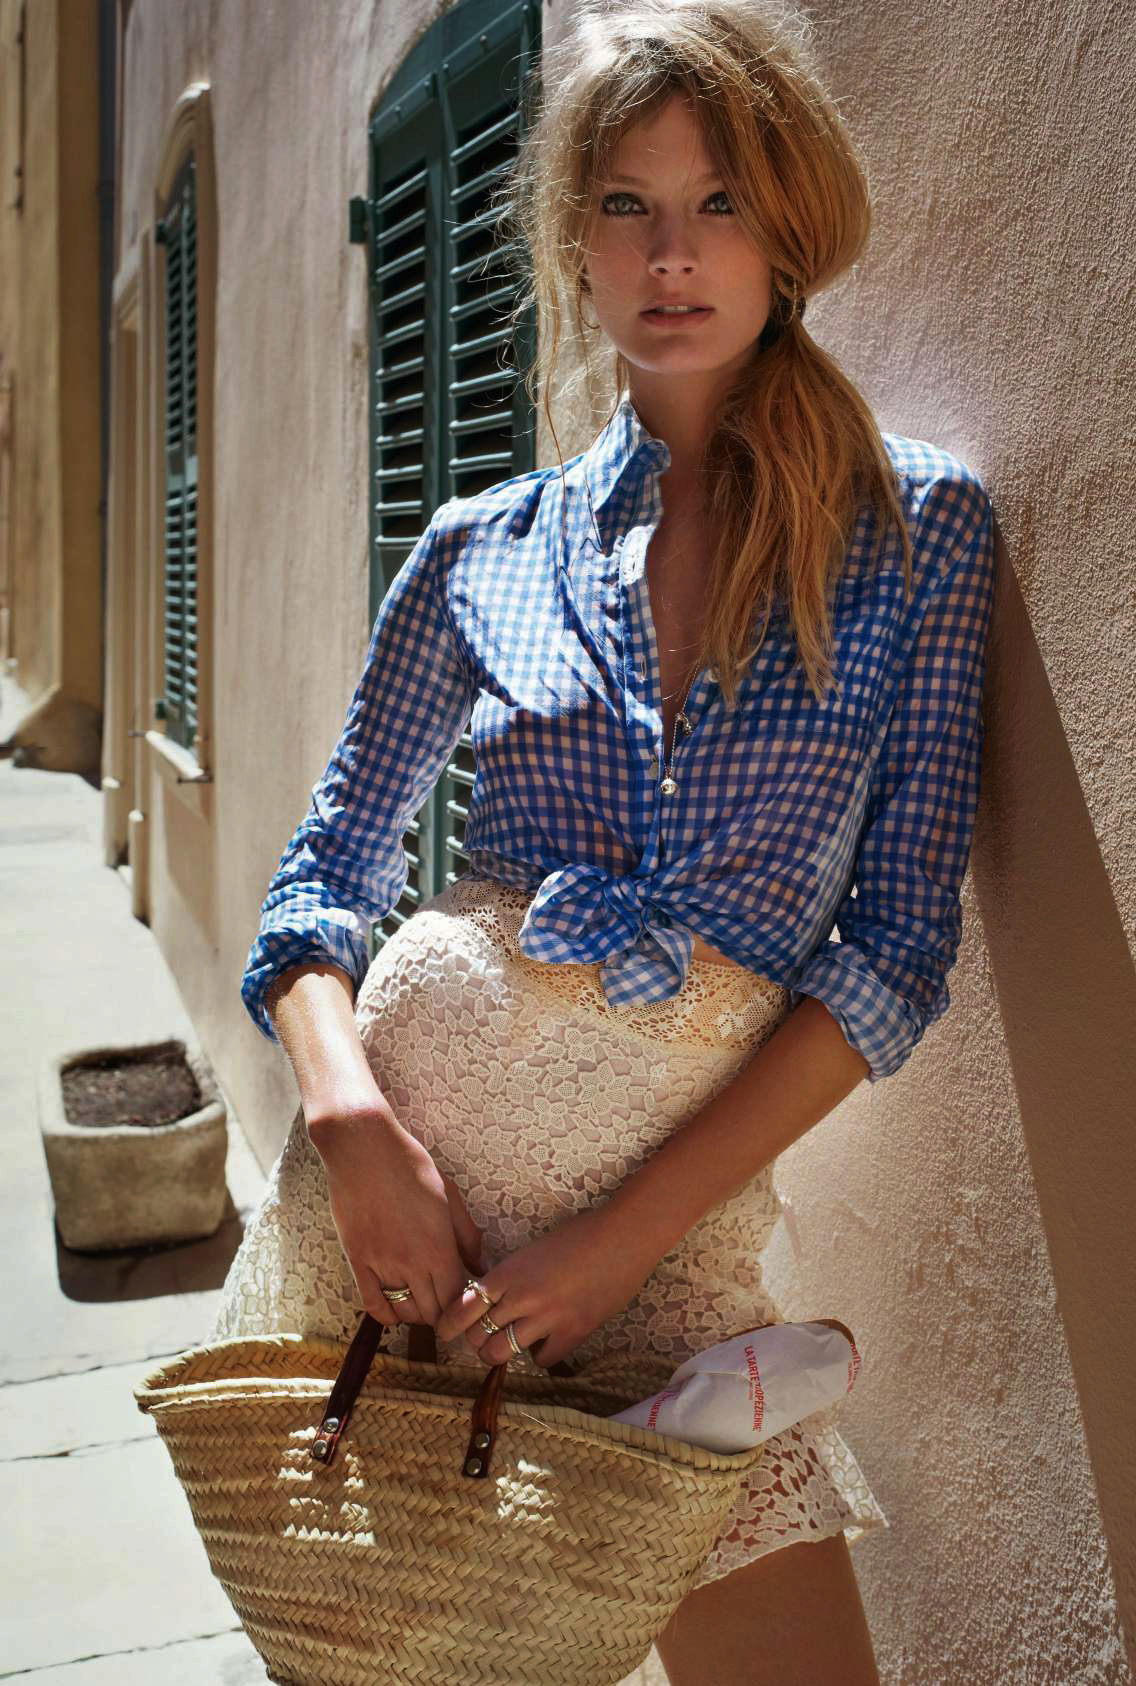 Рубашка, Altuzarra au Bon Marché Rive Gauche; мини-юбка, Ba&Sh; серьги-креолы, Stone Paris; ожерелье, Dodo; колье, Dior Joaillerie; кольца, Pomelato и Dodo; сумка - винтаж